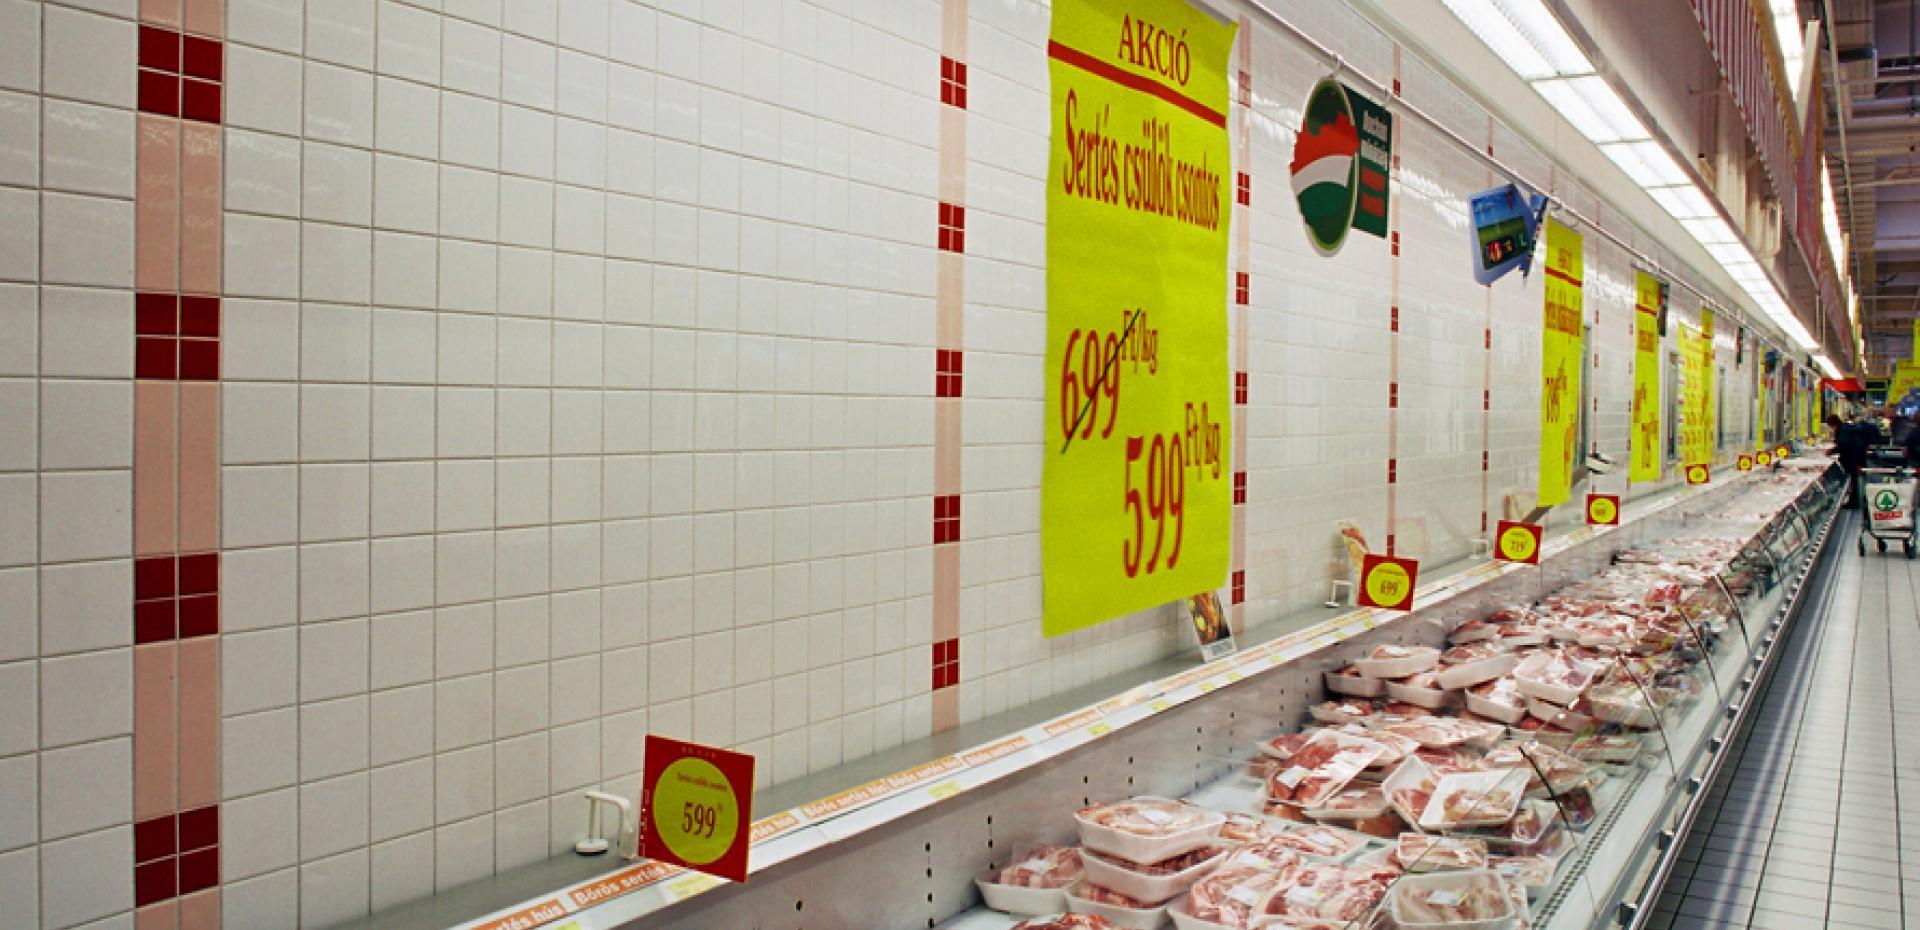 Auchan Budapest